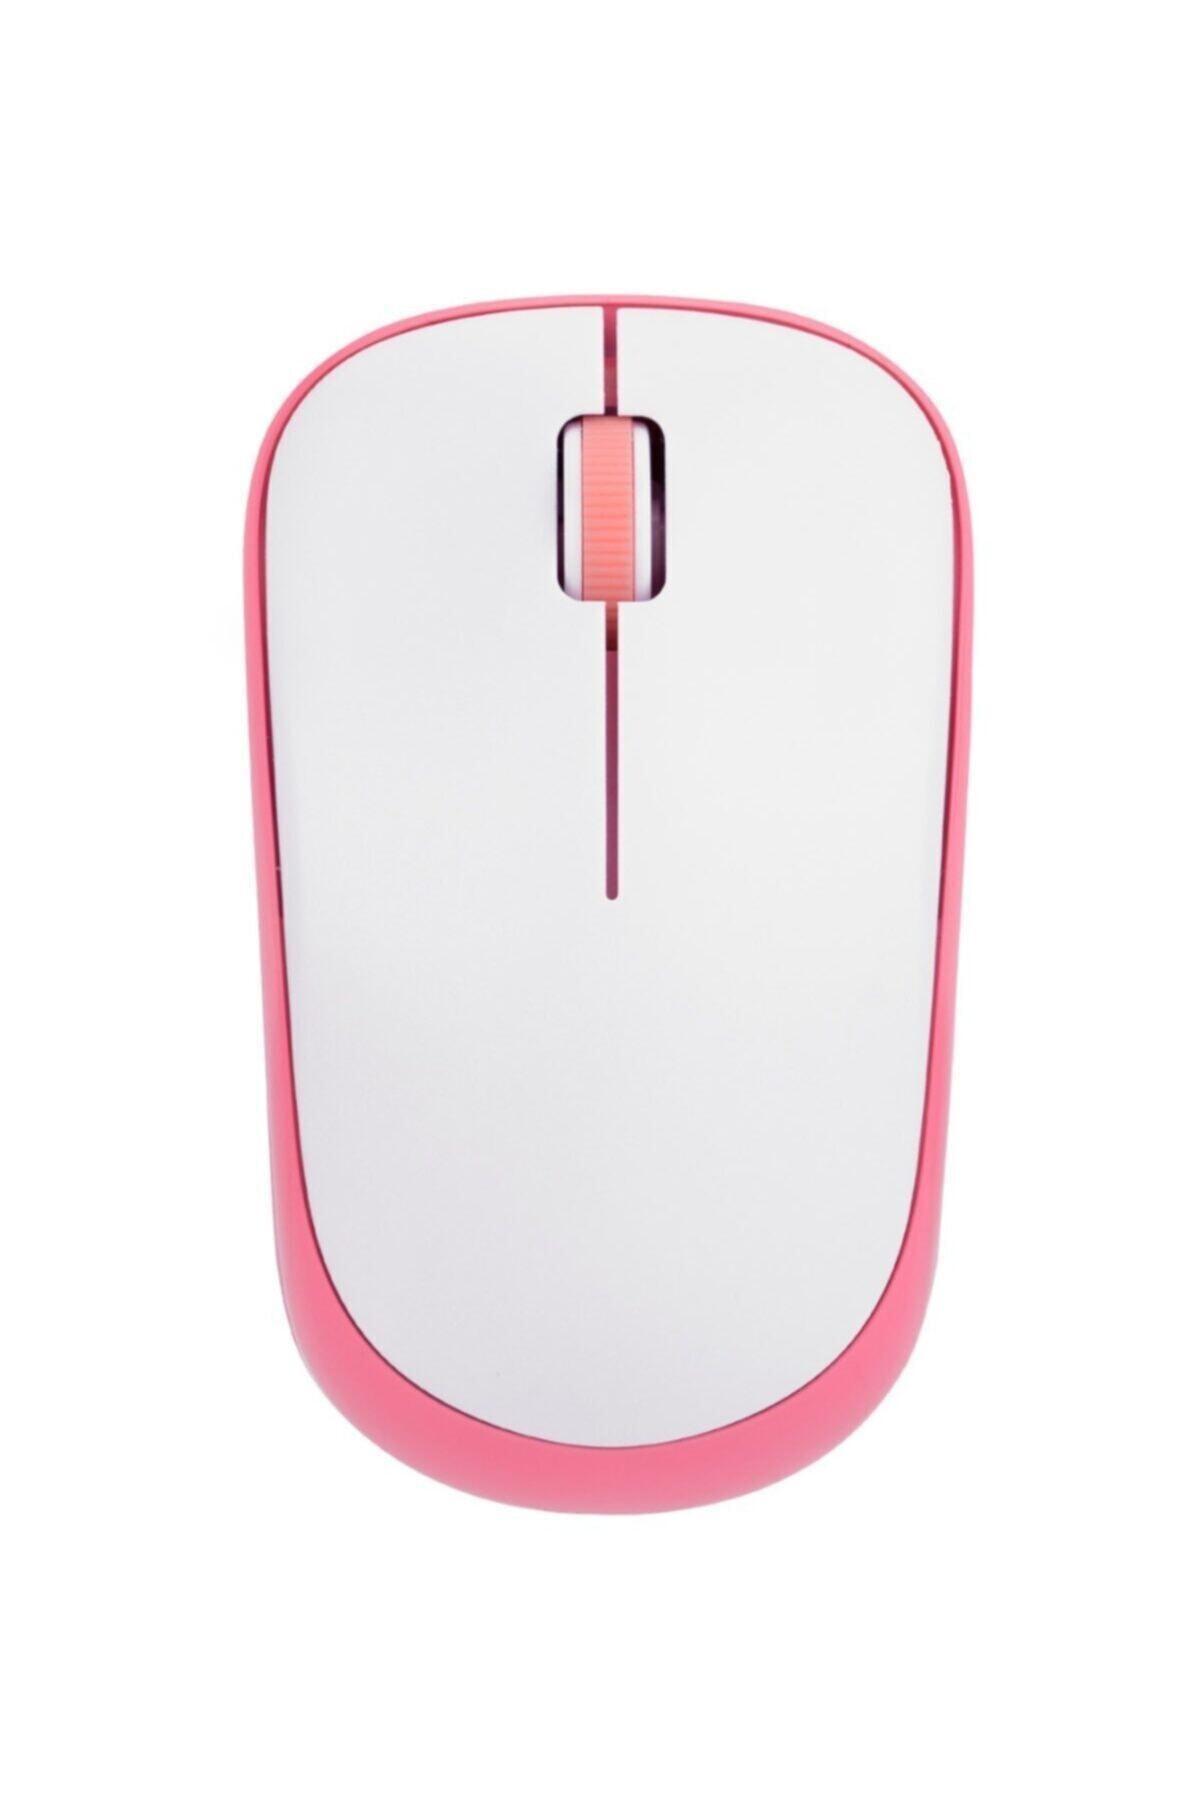 Sm-833 Usb Beyaz/pembe 1200dpi Optik Kablosuz Mouse